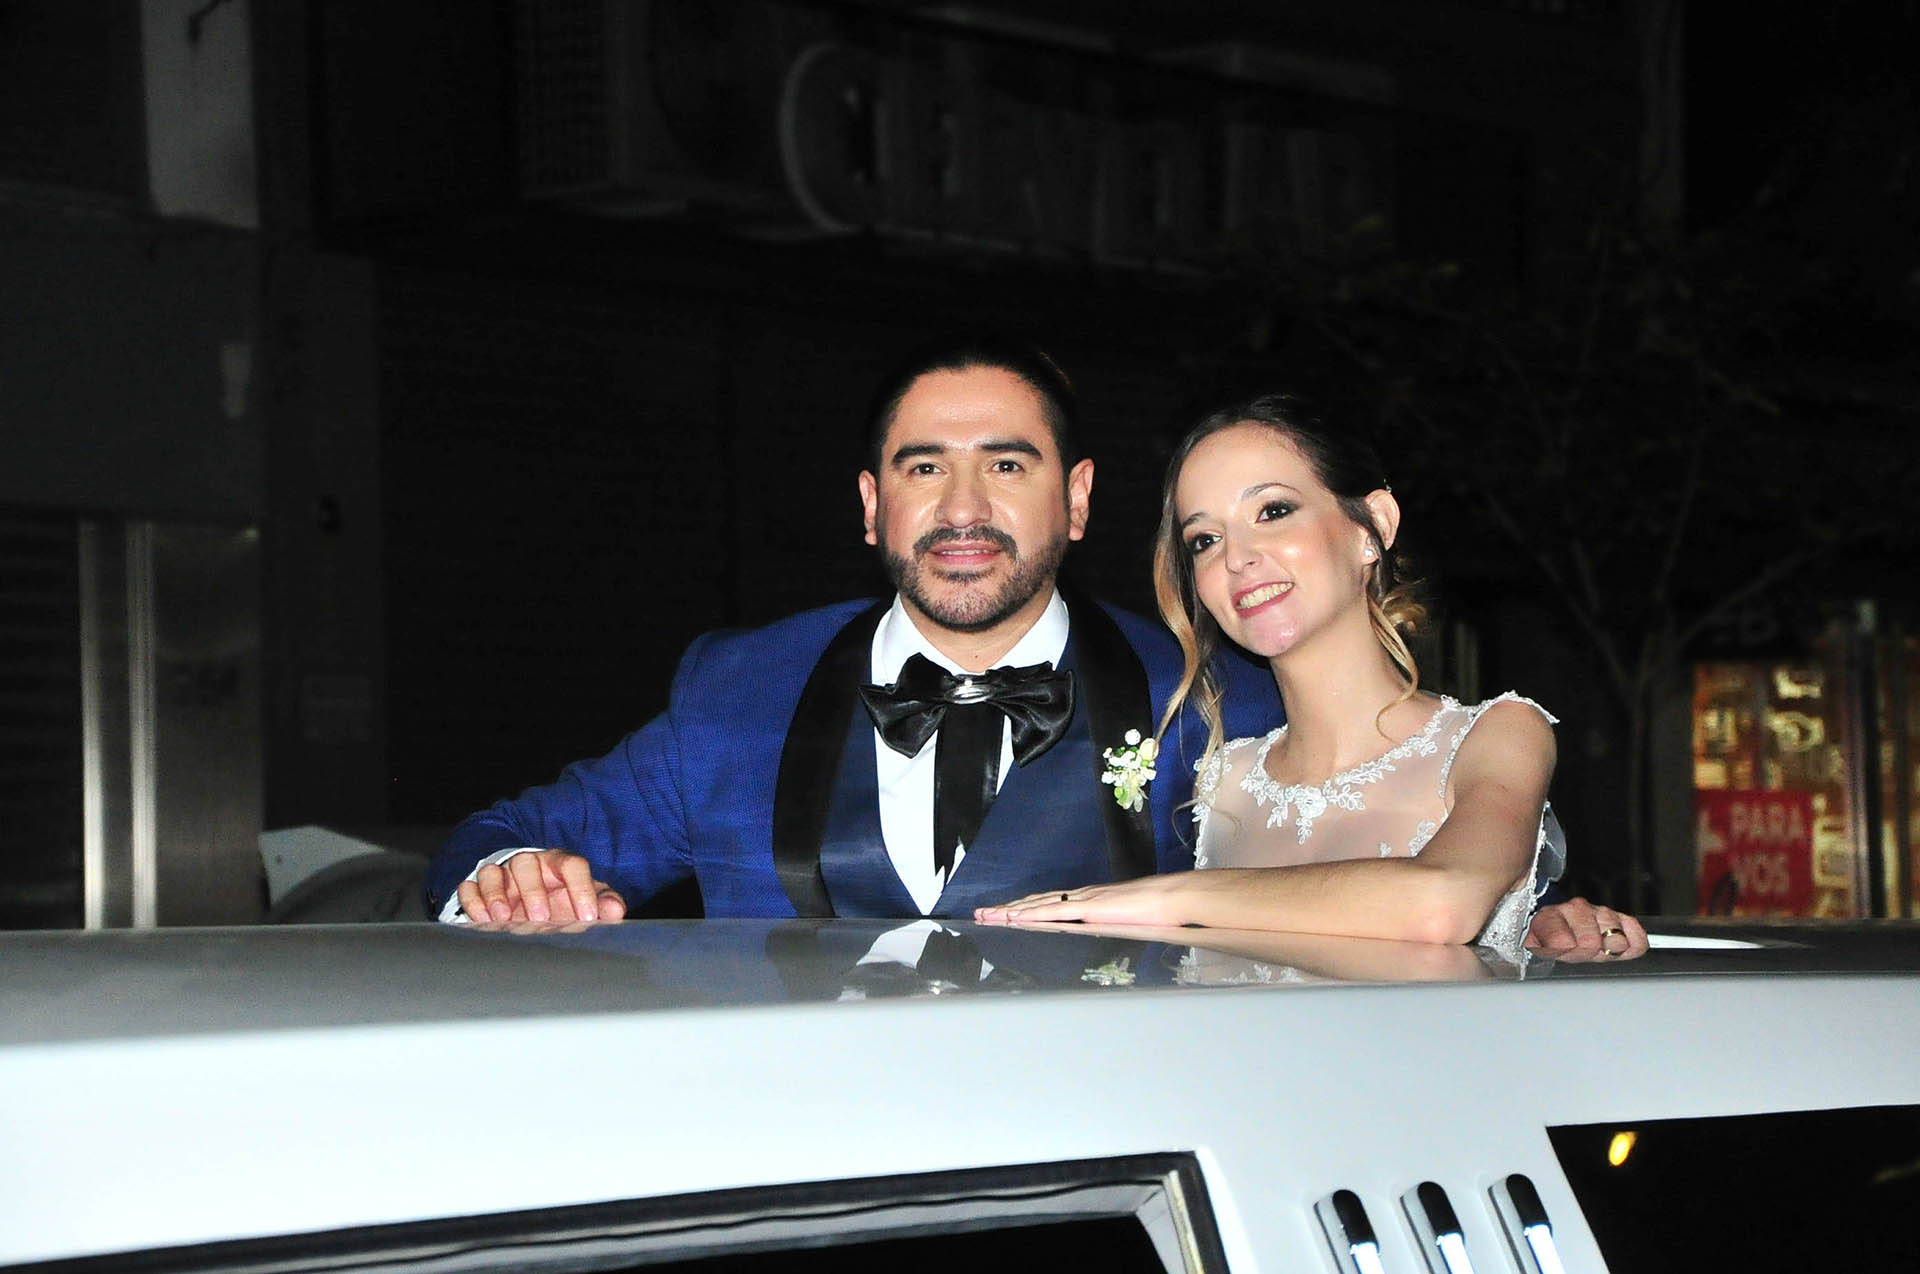 Ariel Puchetta y Camila Minoldo (Fotos: Teleshow/Veronica Guerman)